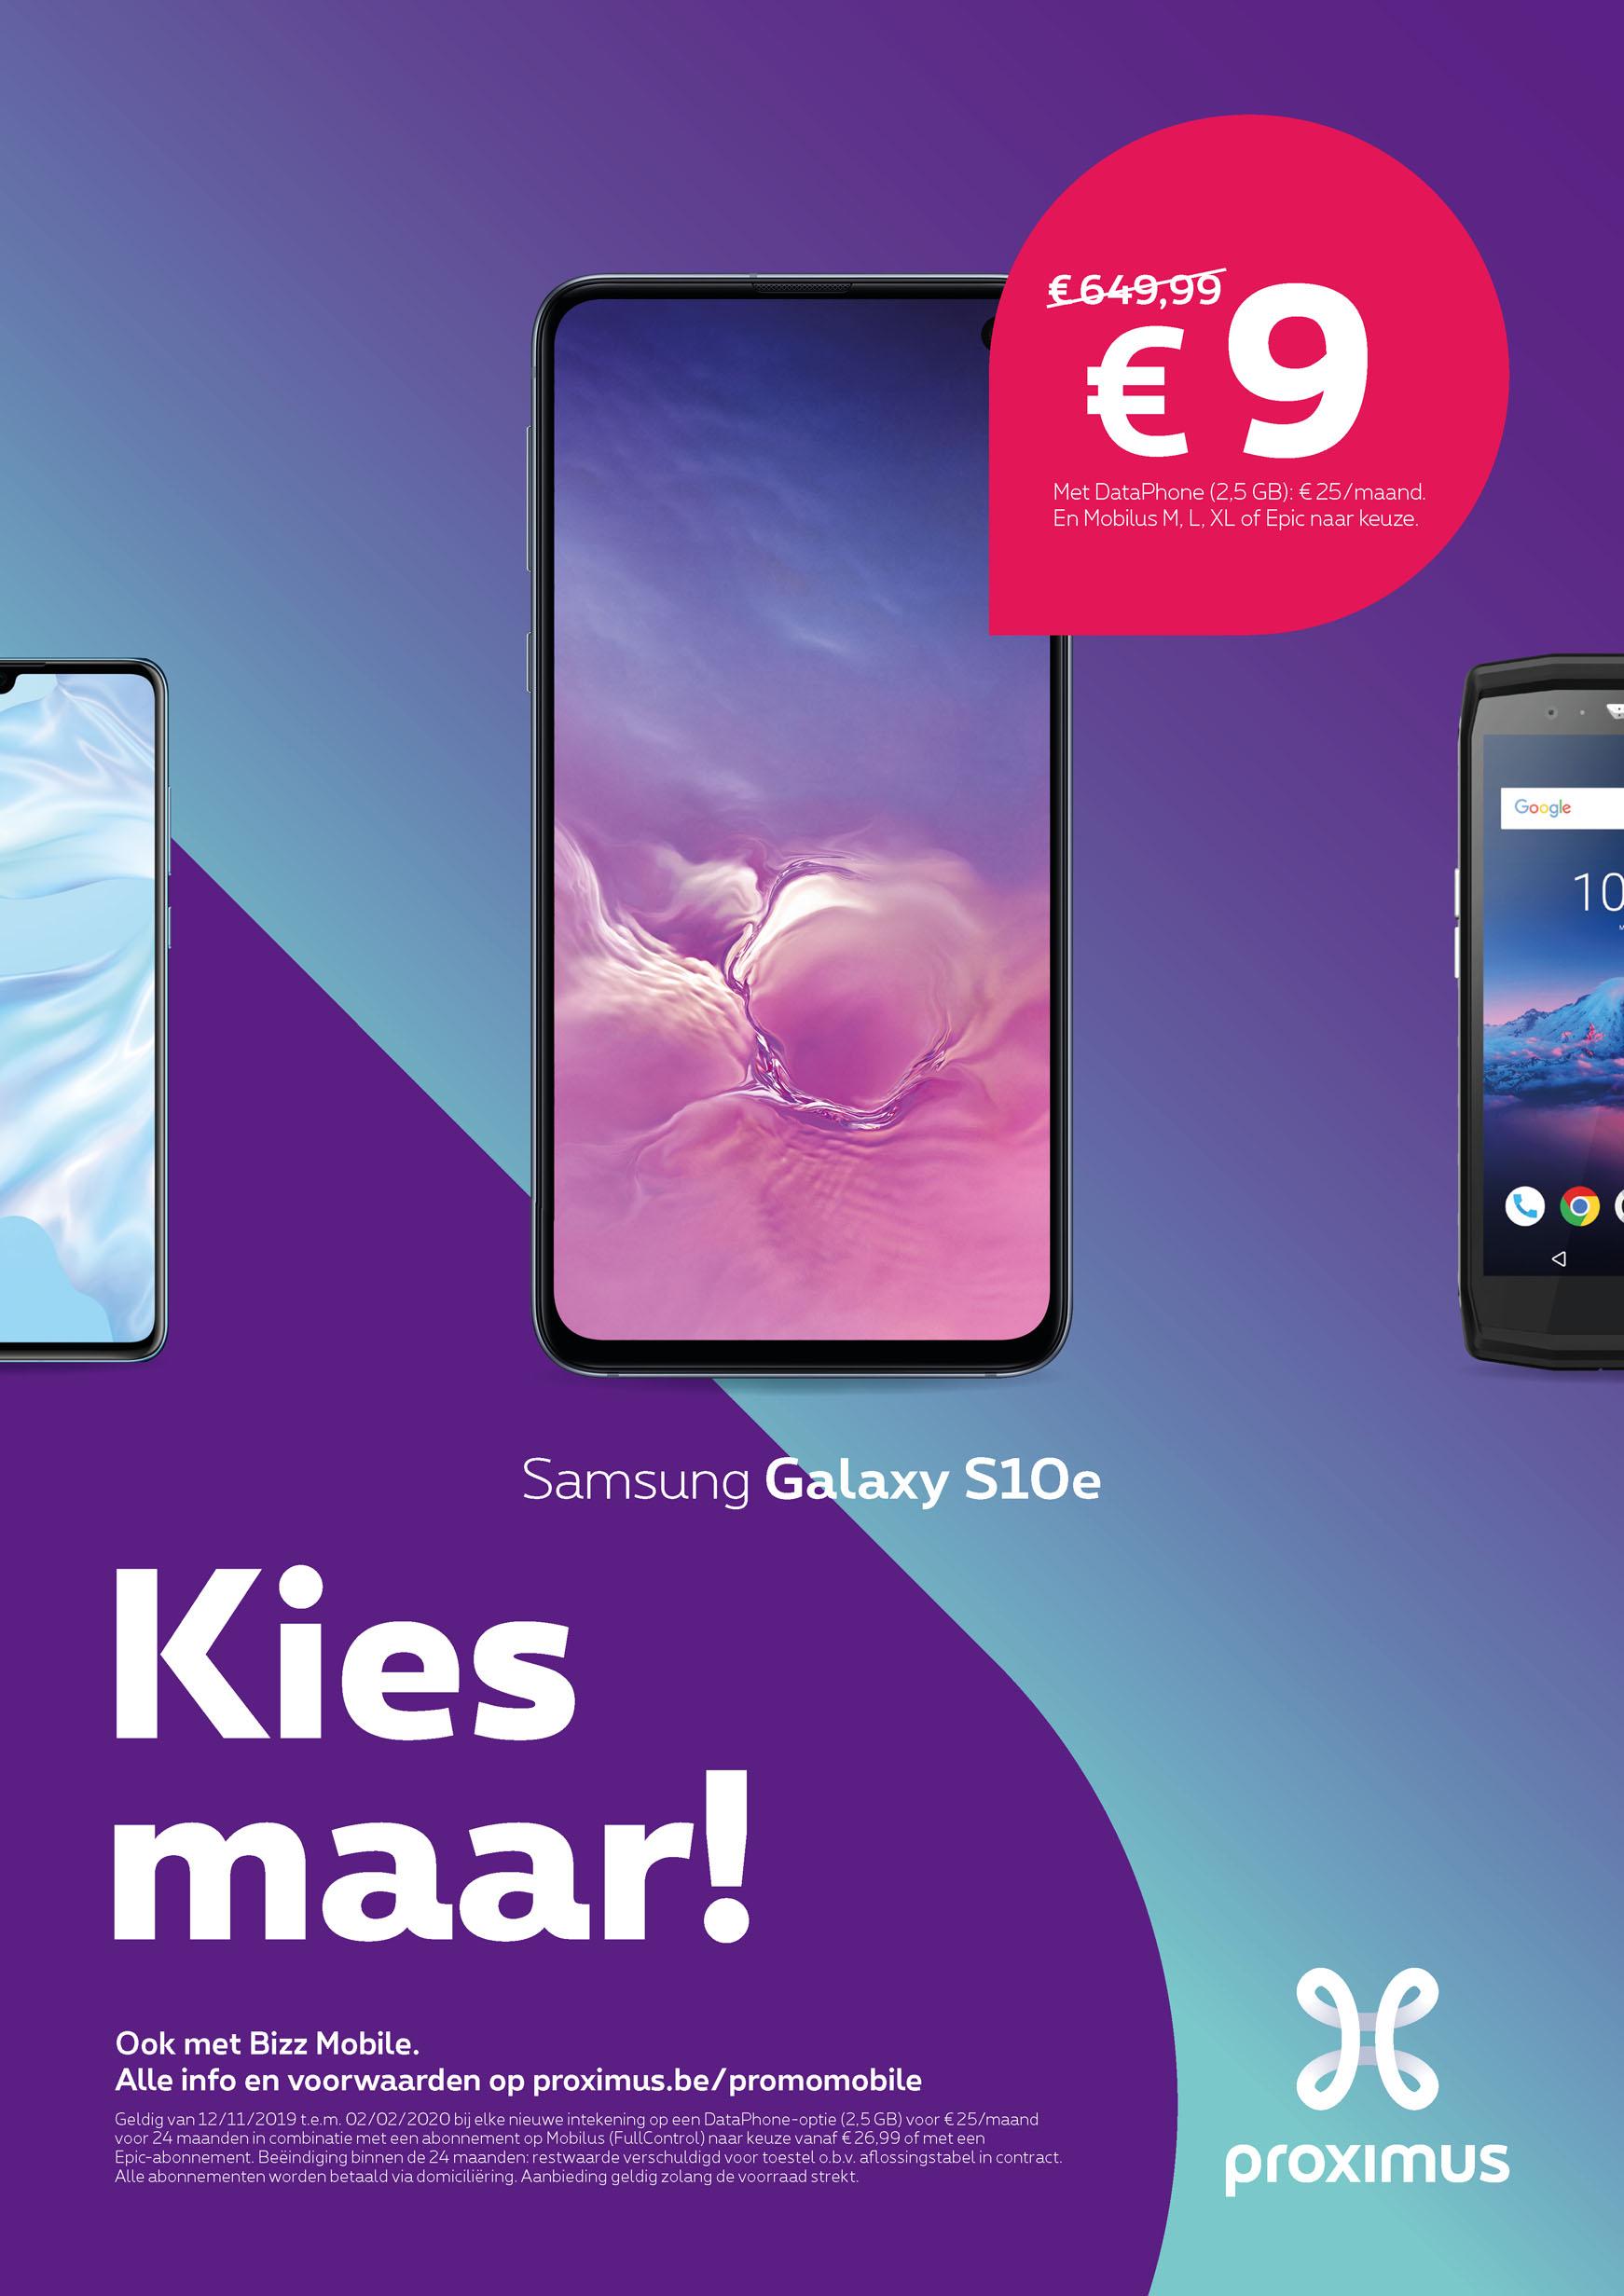 Promotions_JO_JO_Samsung_Galaxy_S10e_201